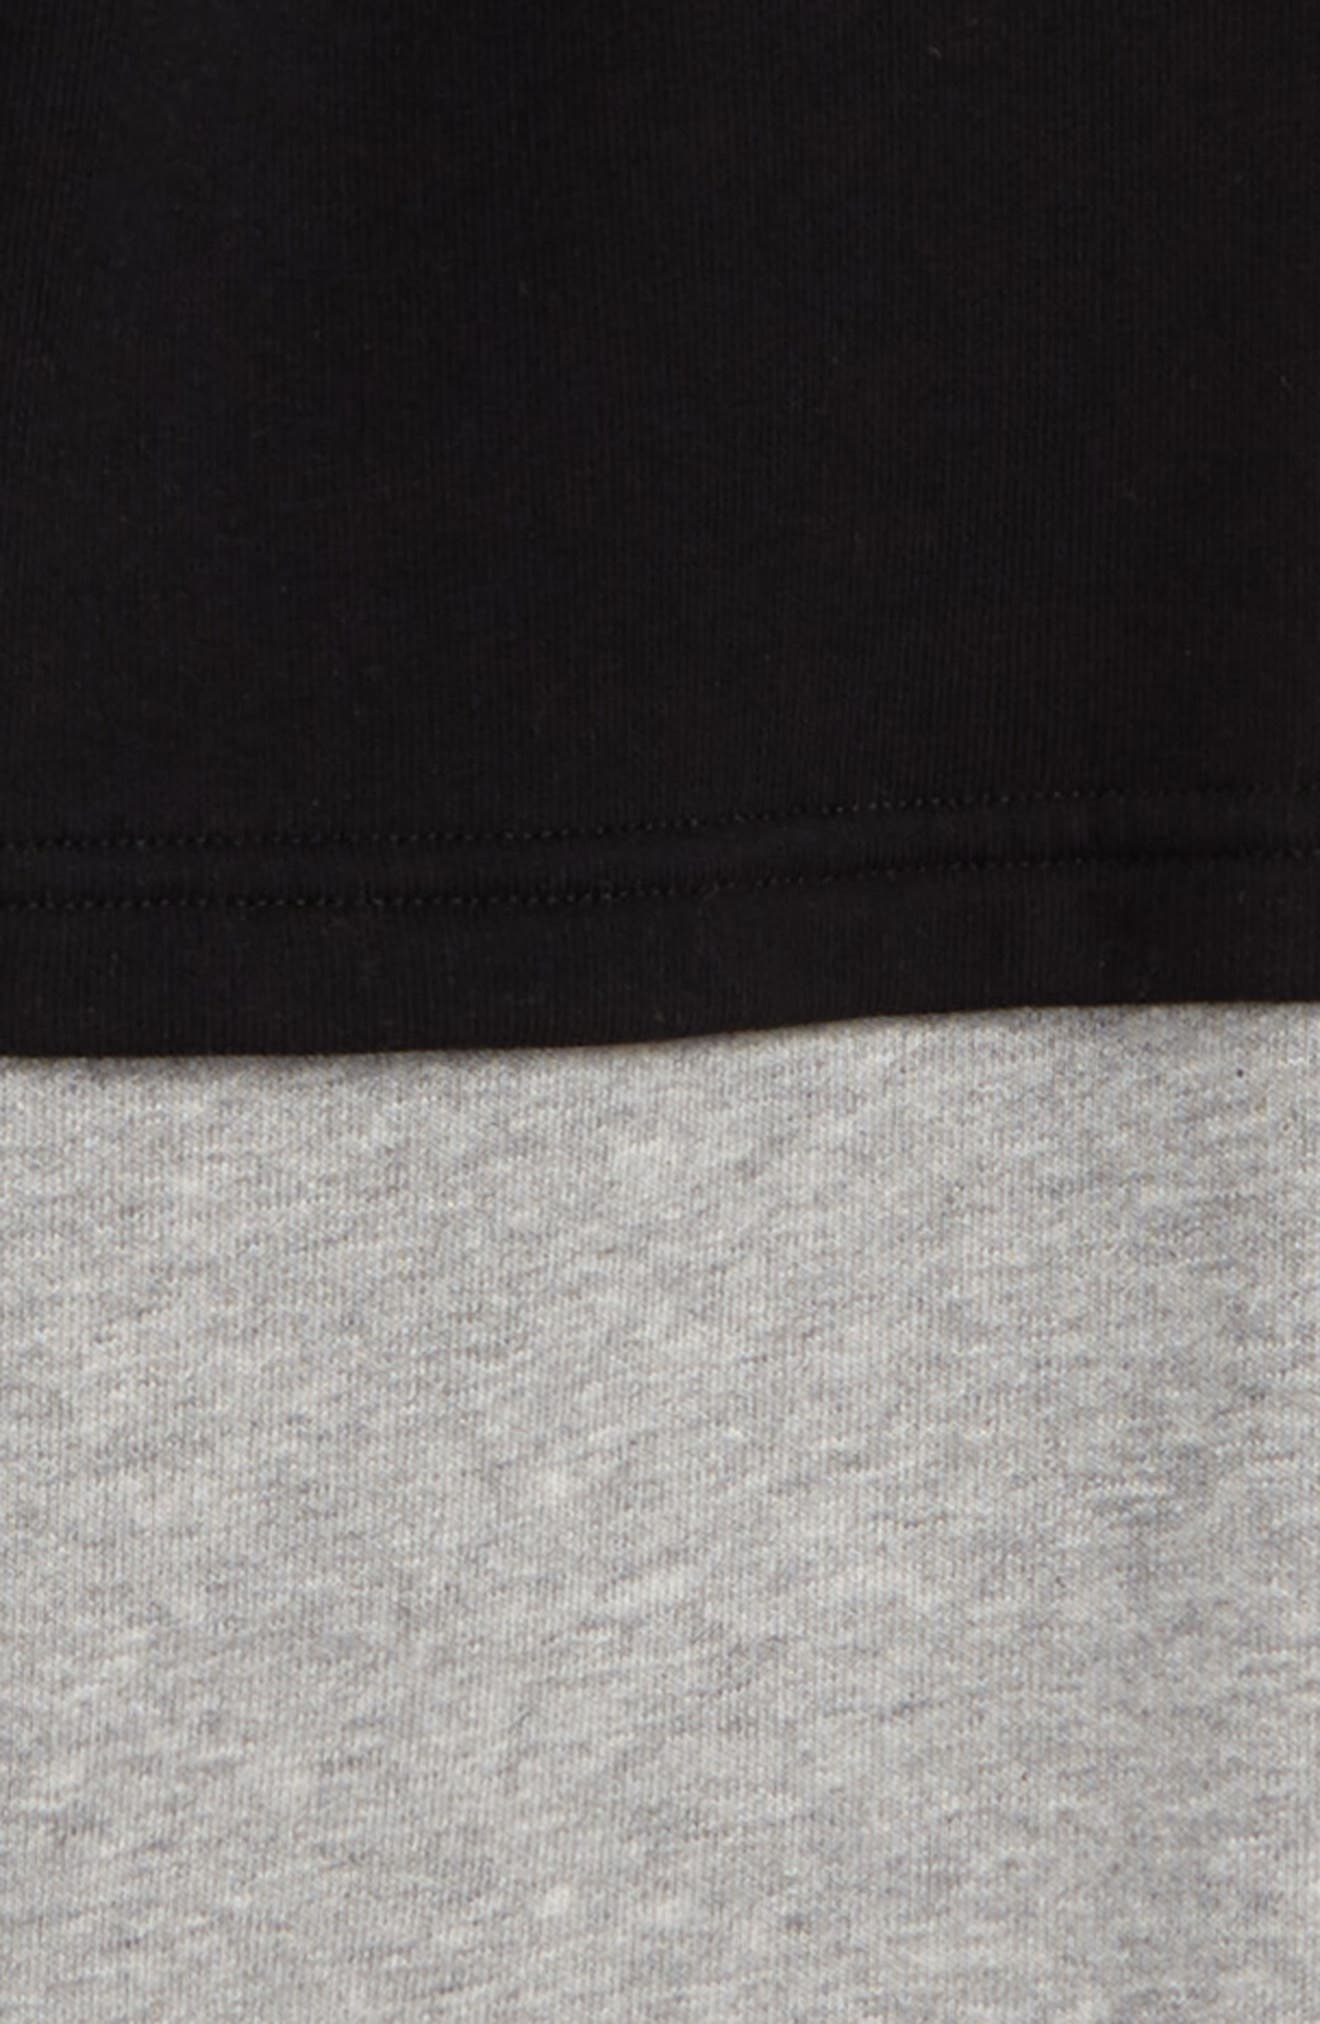 Double Sweatpants,                             Alternate thumbnail 2, color,                             Black/ Heather Grey